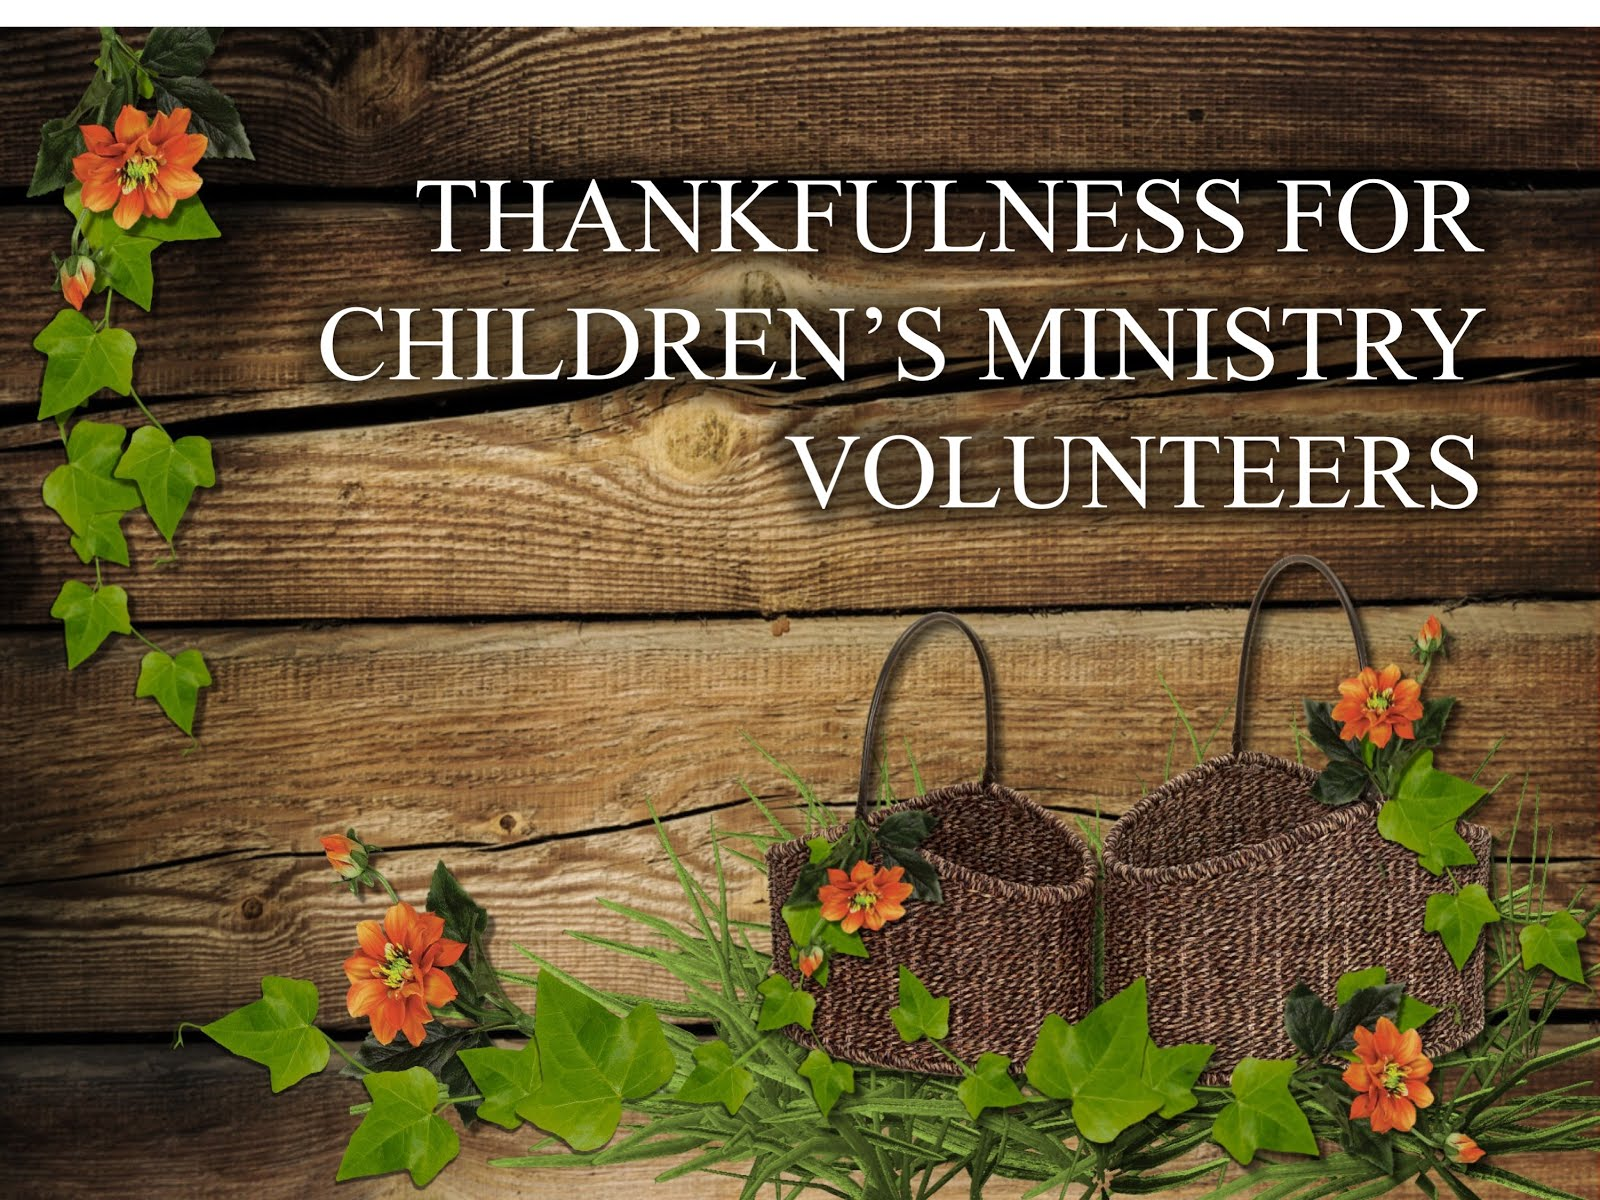 Church volunteer appreciation ideas and thank you notes |Thank You Church Volunteers